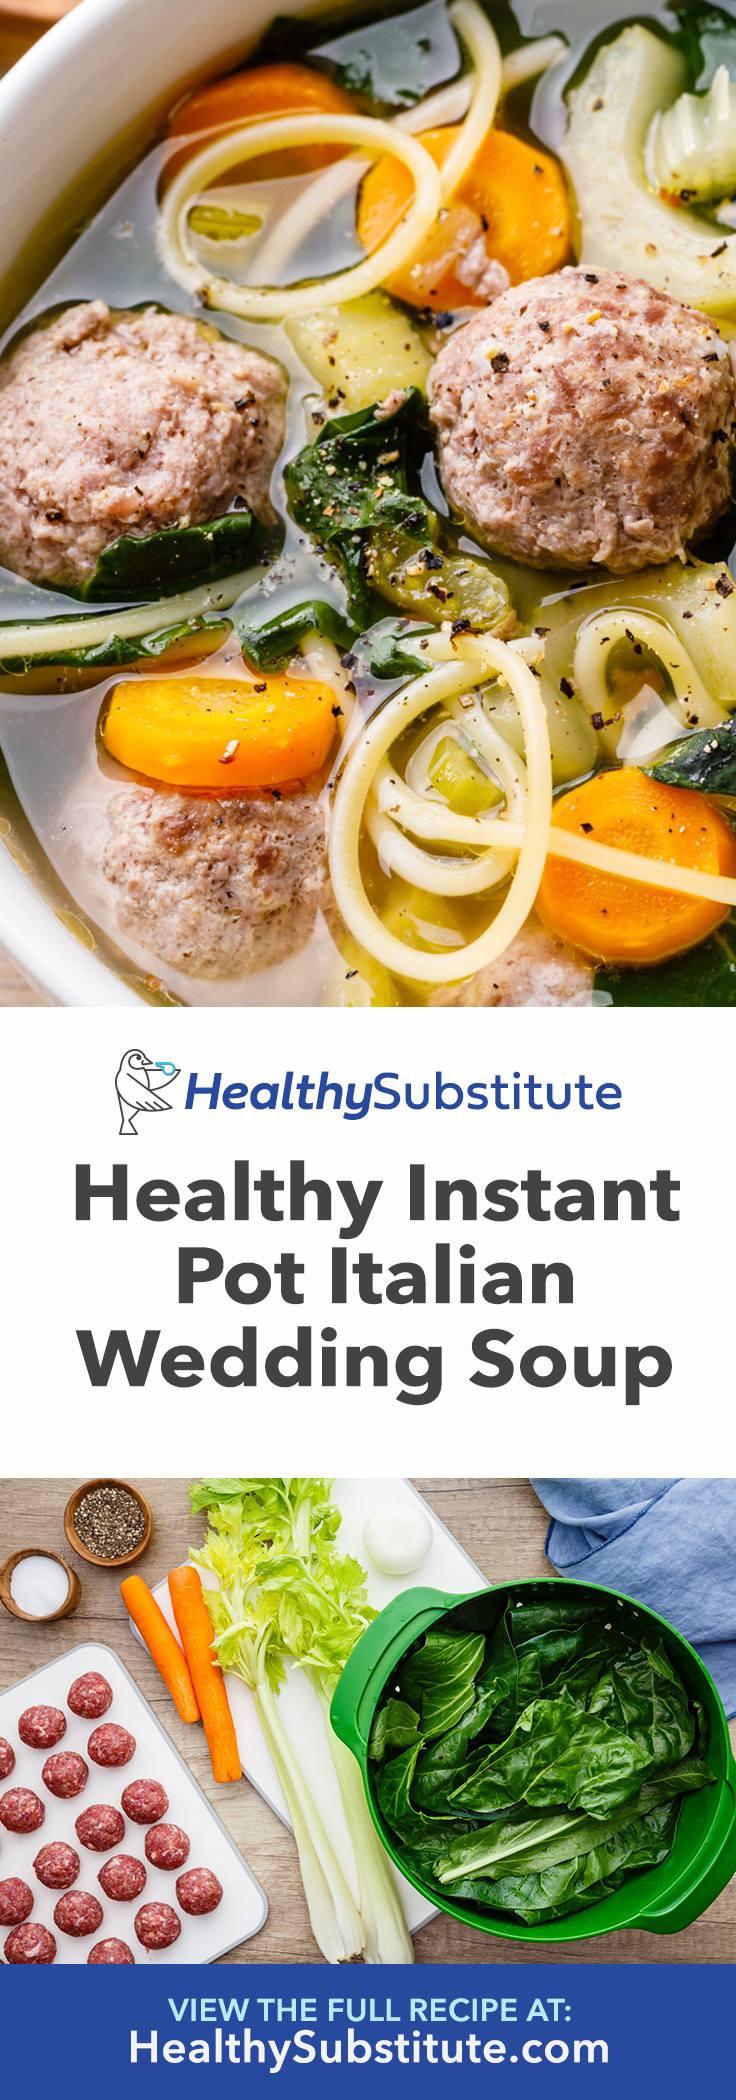 Metabolism Boosting Instant Pot Italian Wedding Soup